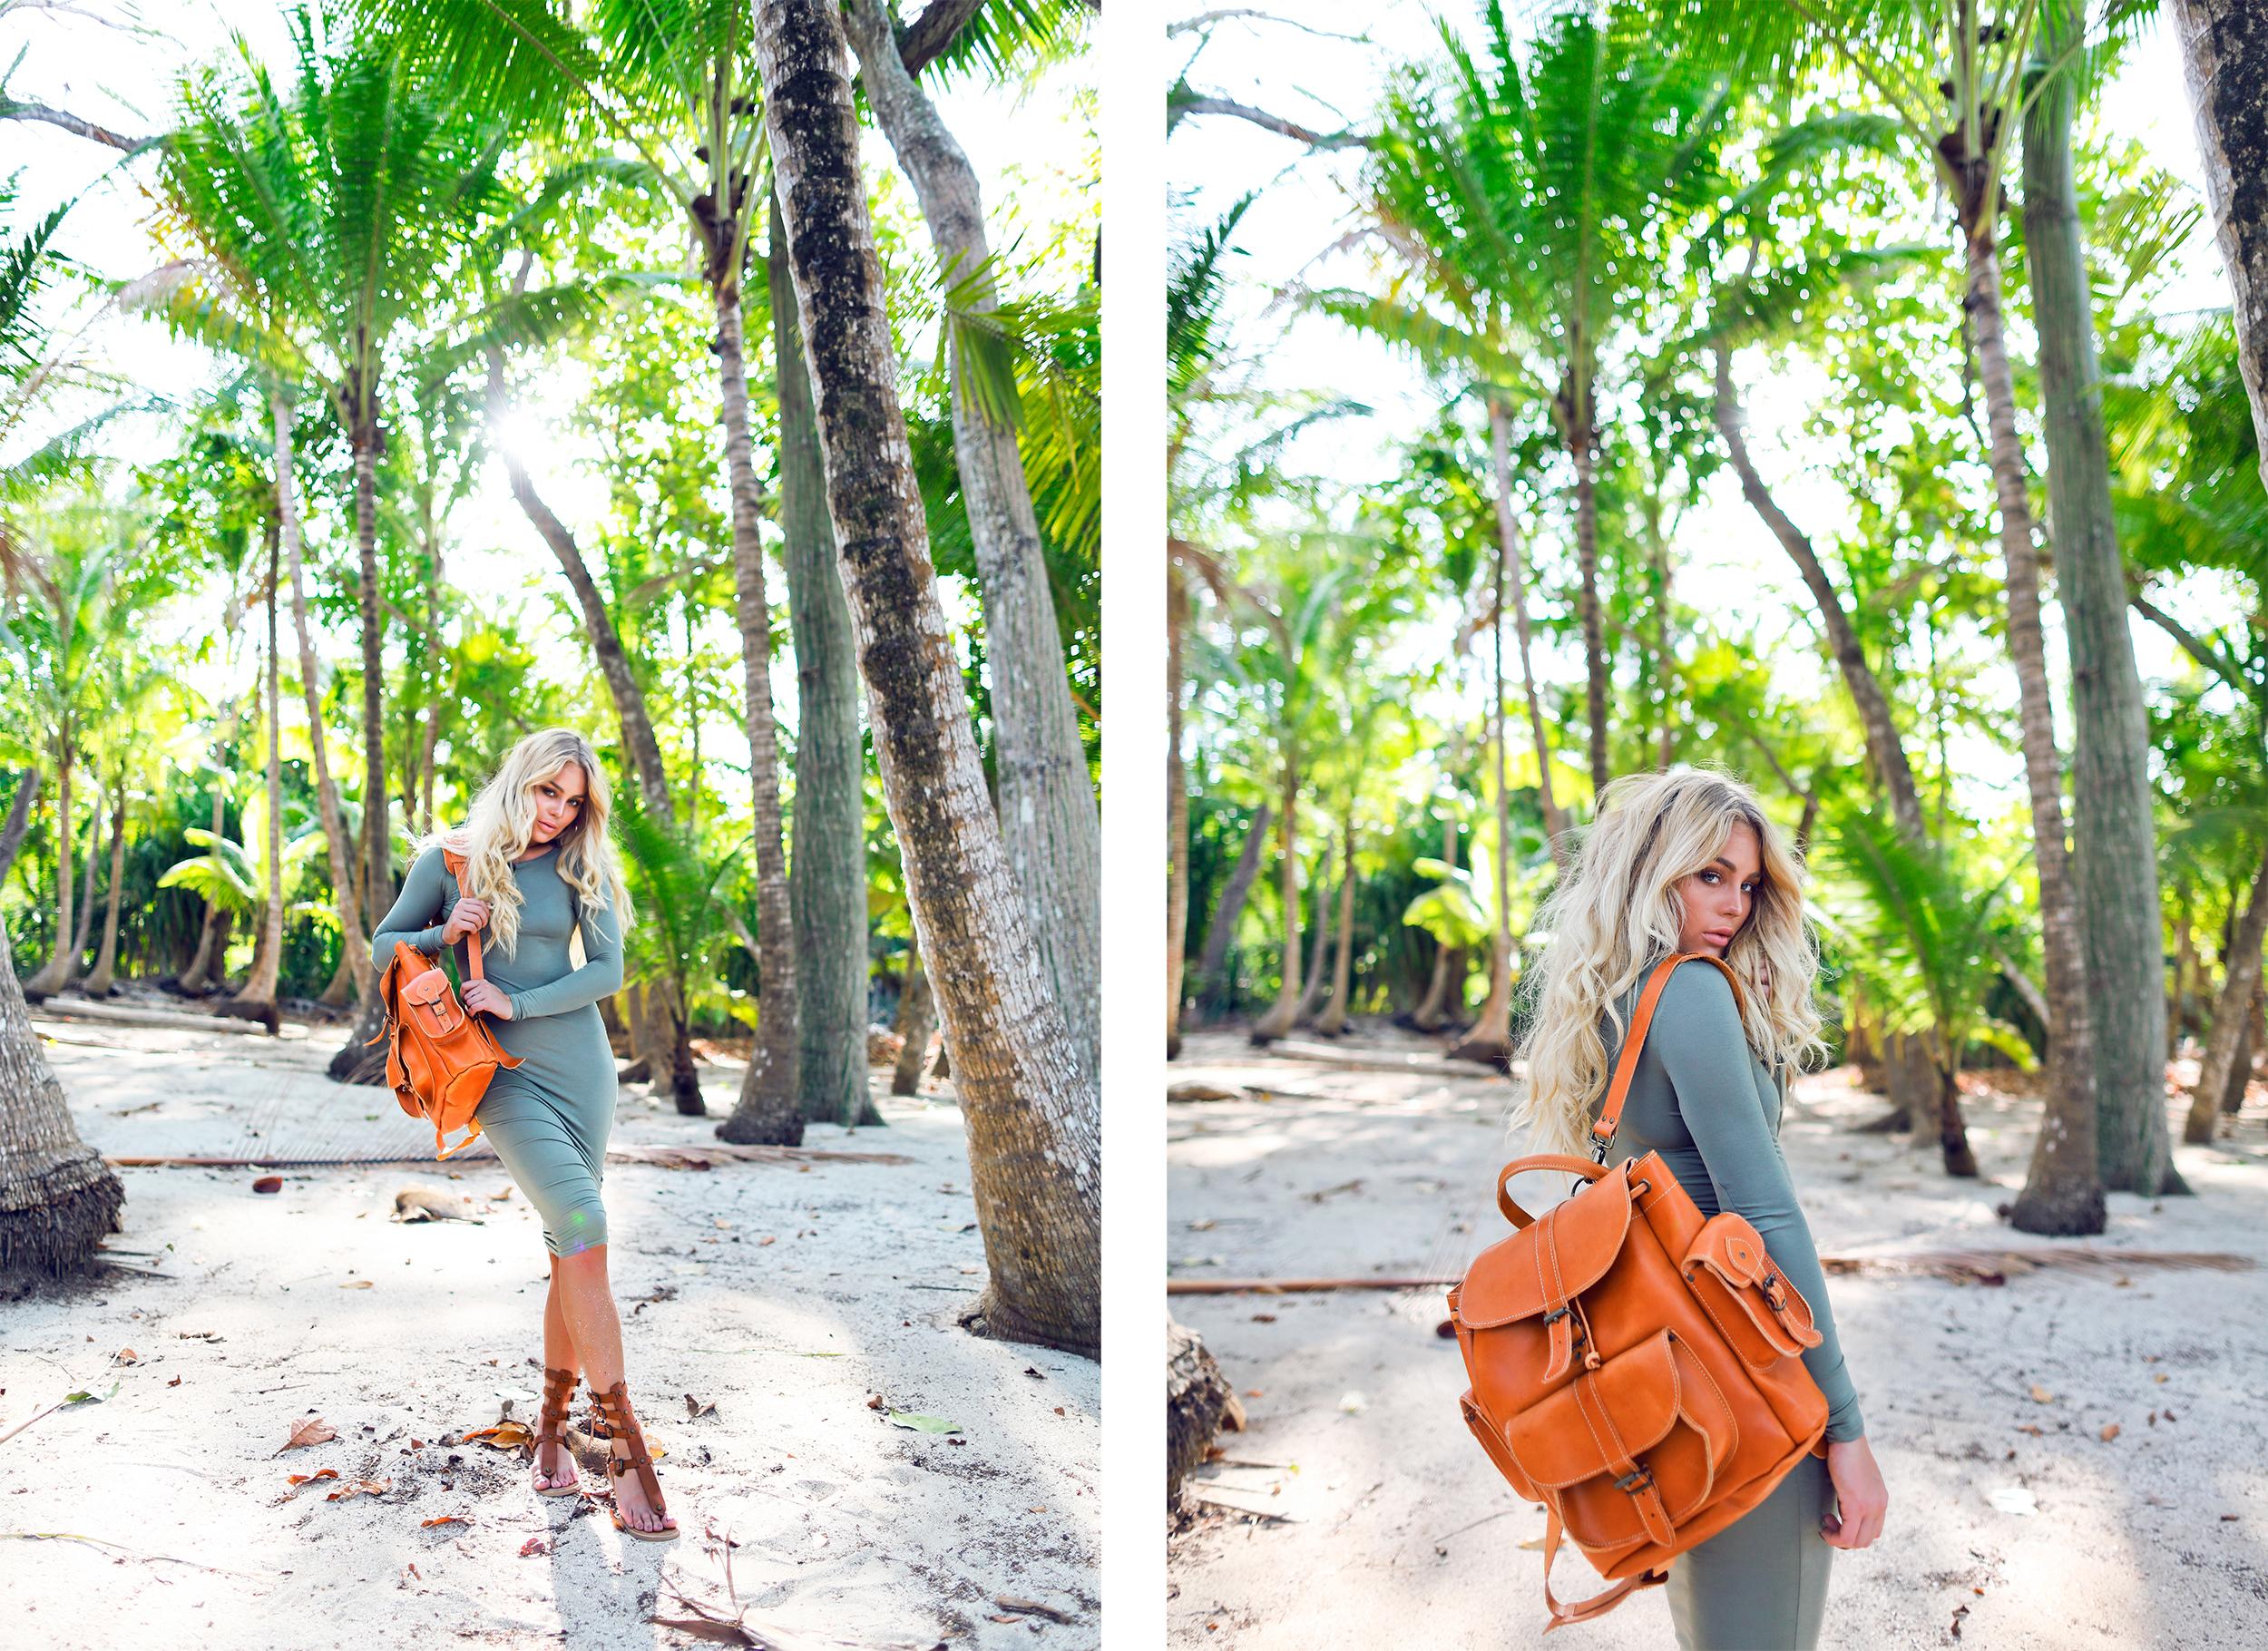 palmtrees_blick8